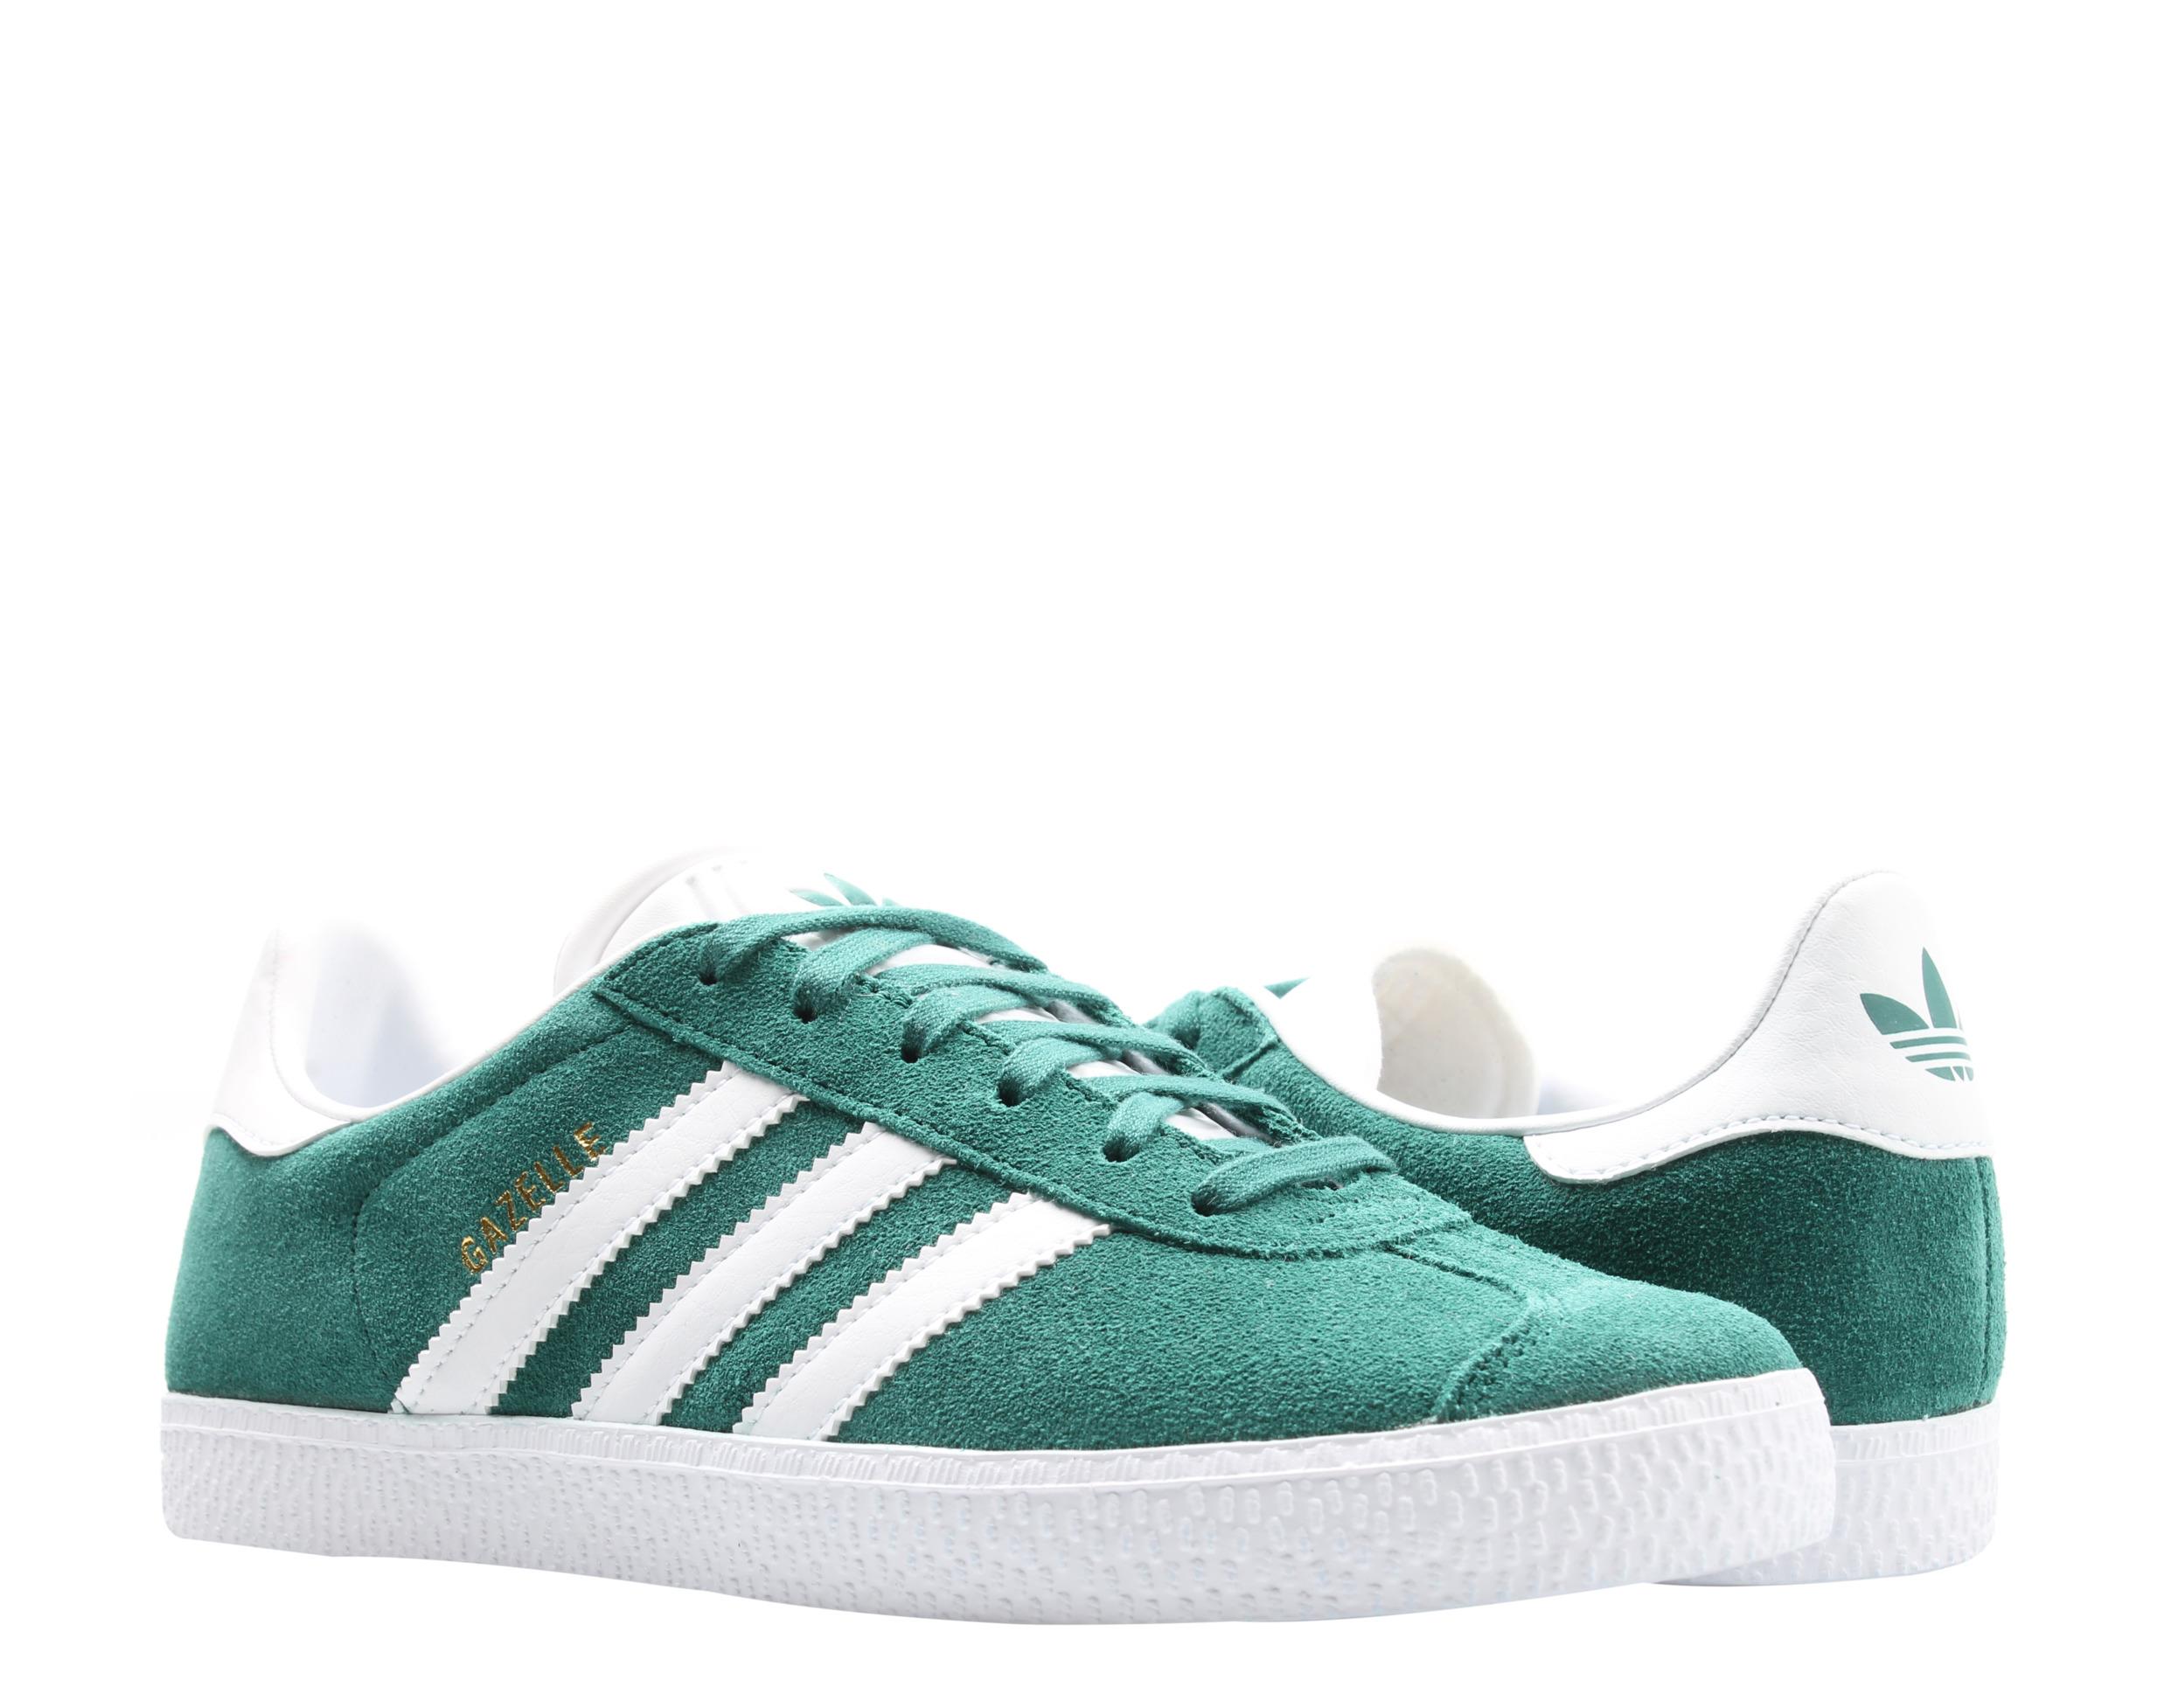 Adidas Originals Gazelle J Noble Green/White Big Kids Casual Shoes ...